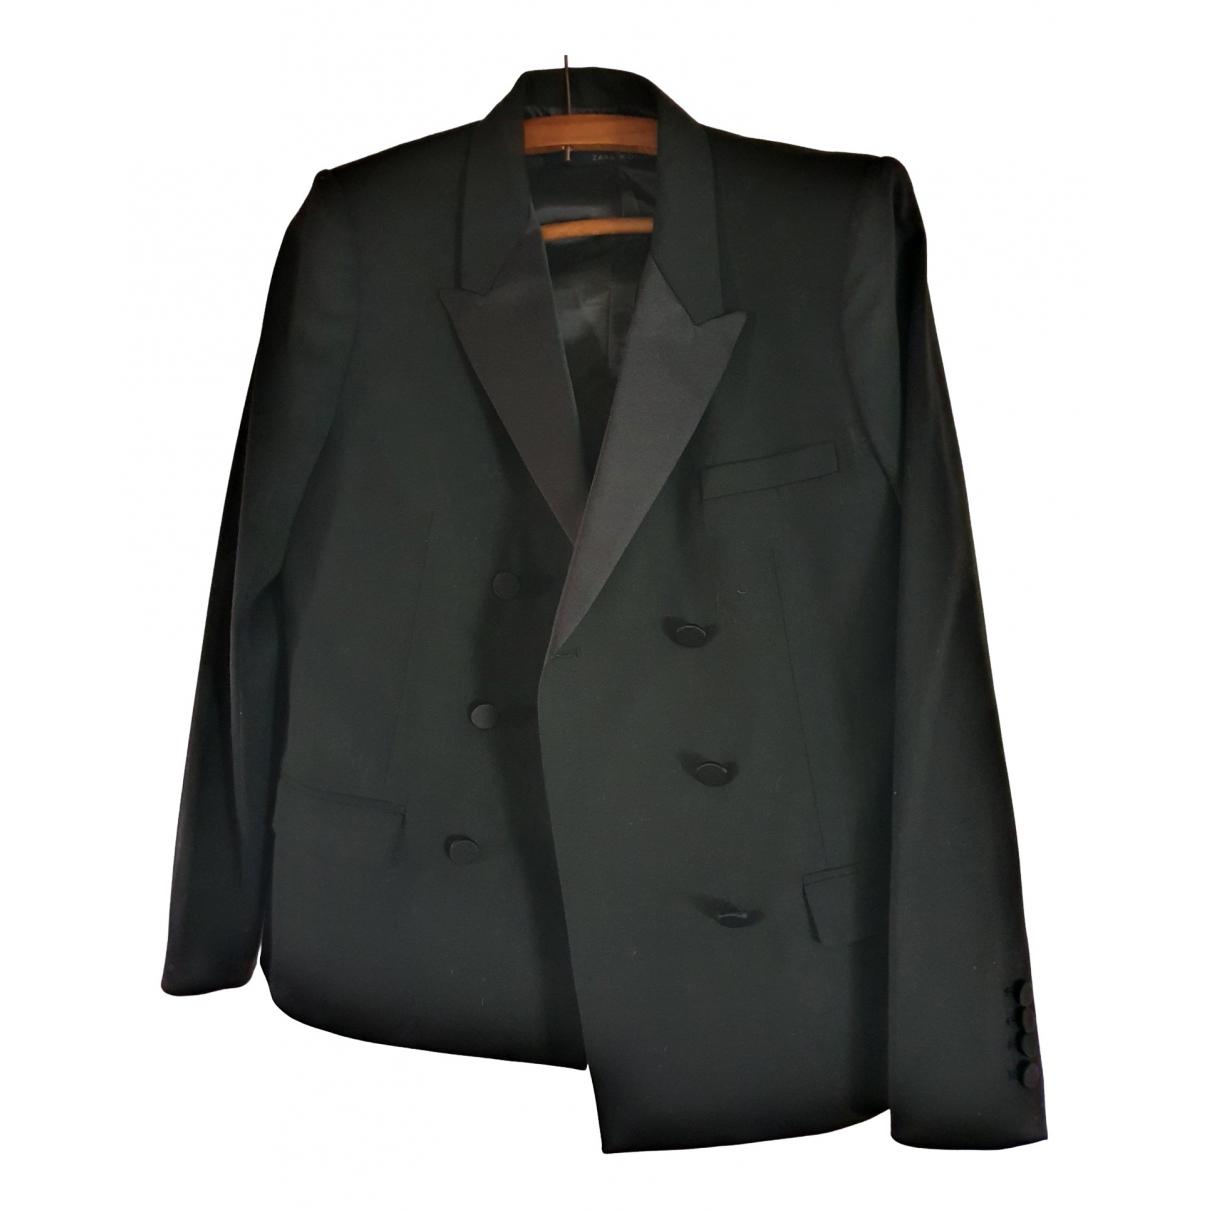 Zara \N Black Cotton jacket for Women L International